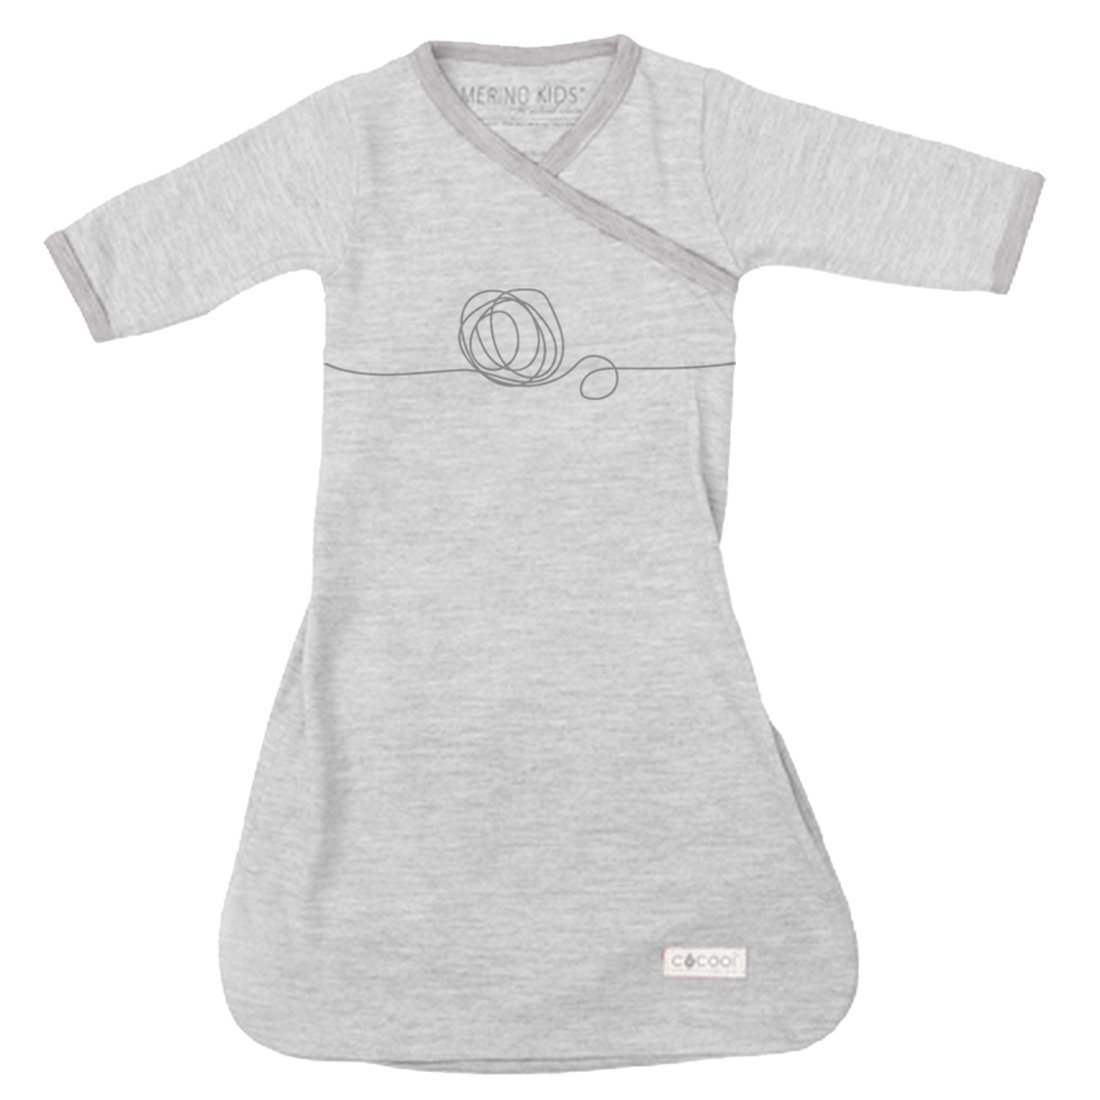 Cocooi Merino Baby Gown, Light Grey/Grey Print, for Newborn Babies COGWWBLGG000